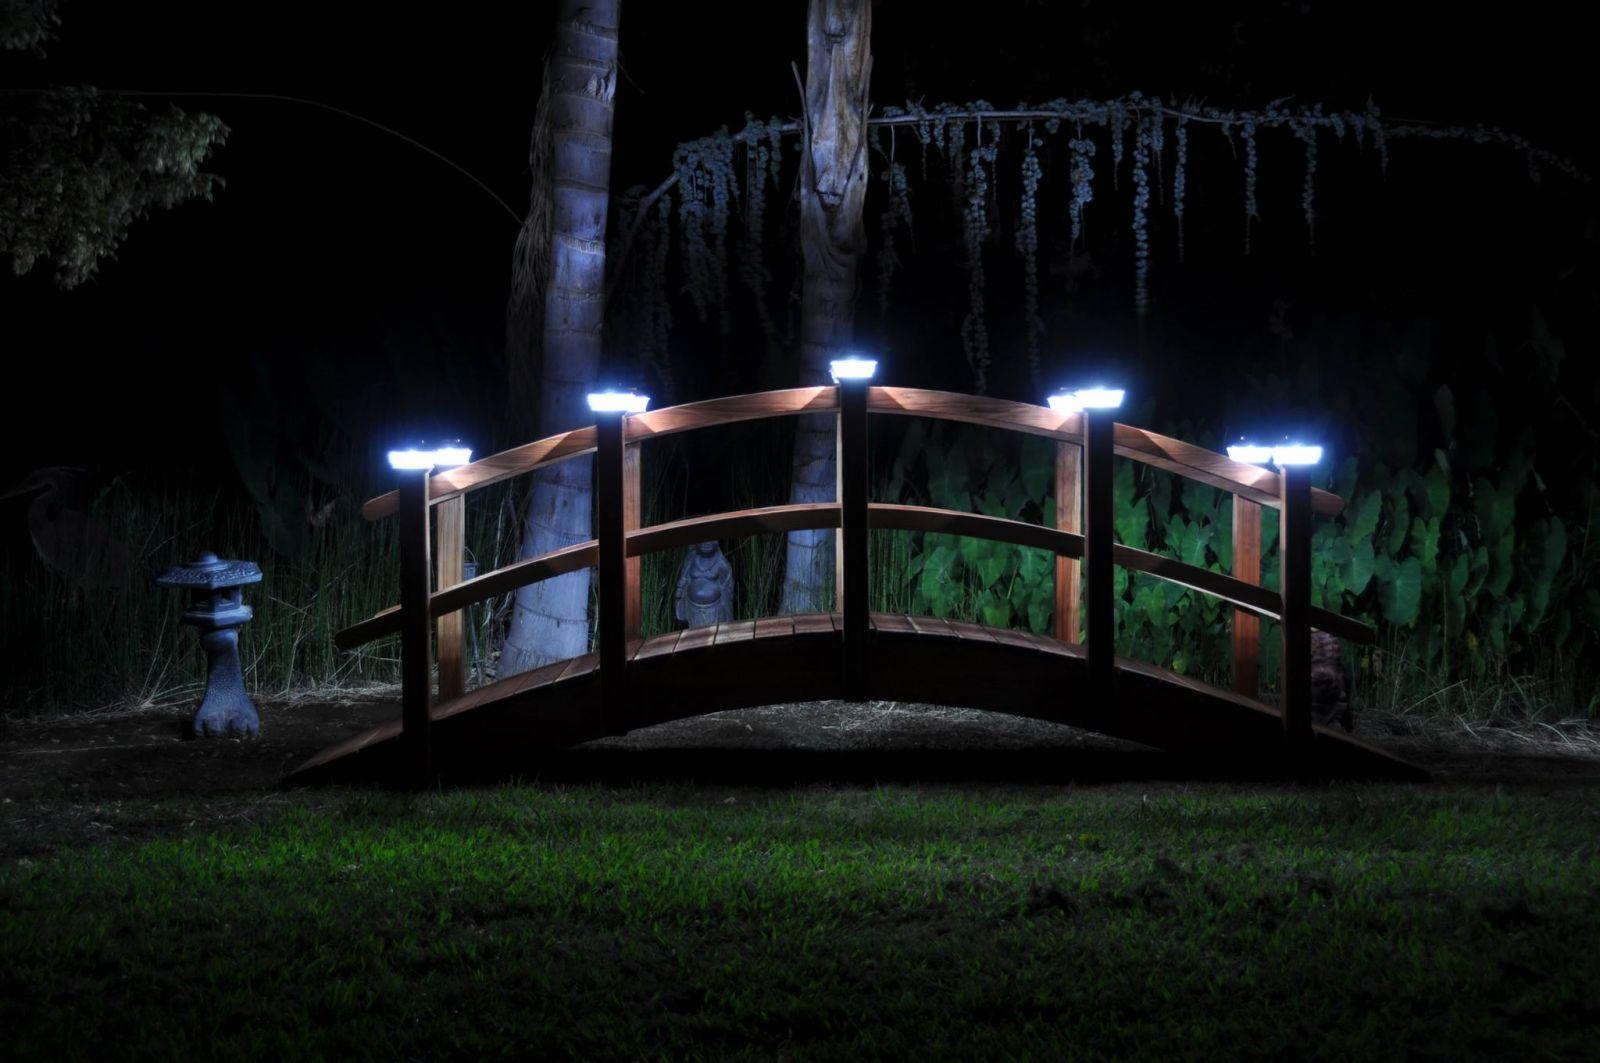 Genial Redwood Garden Bridges For Koi Ponds